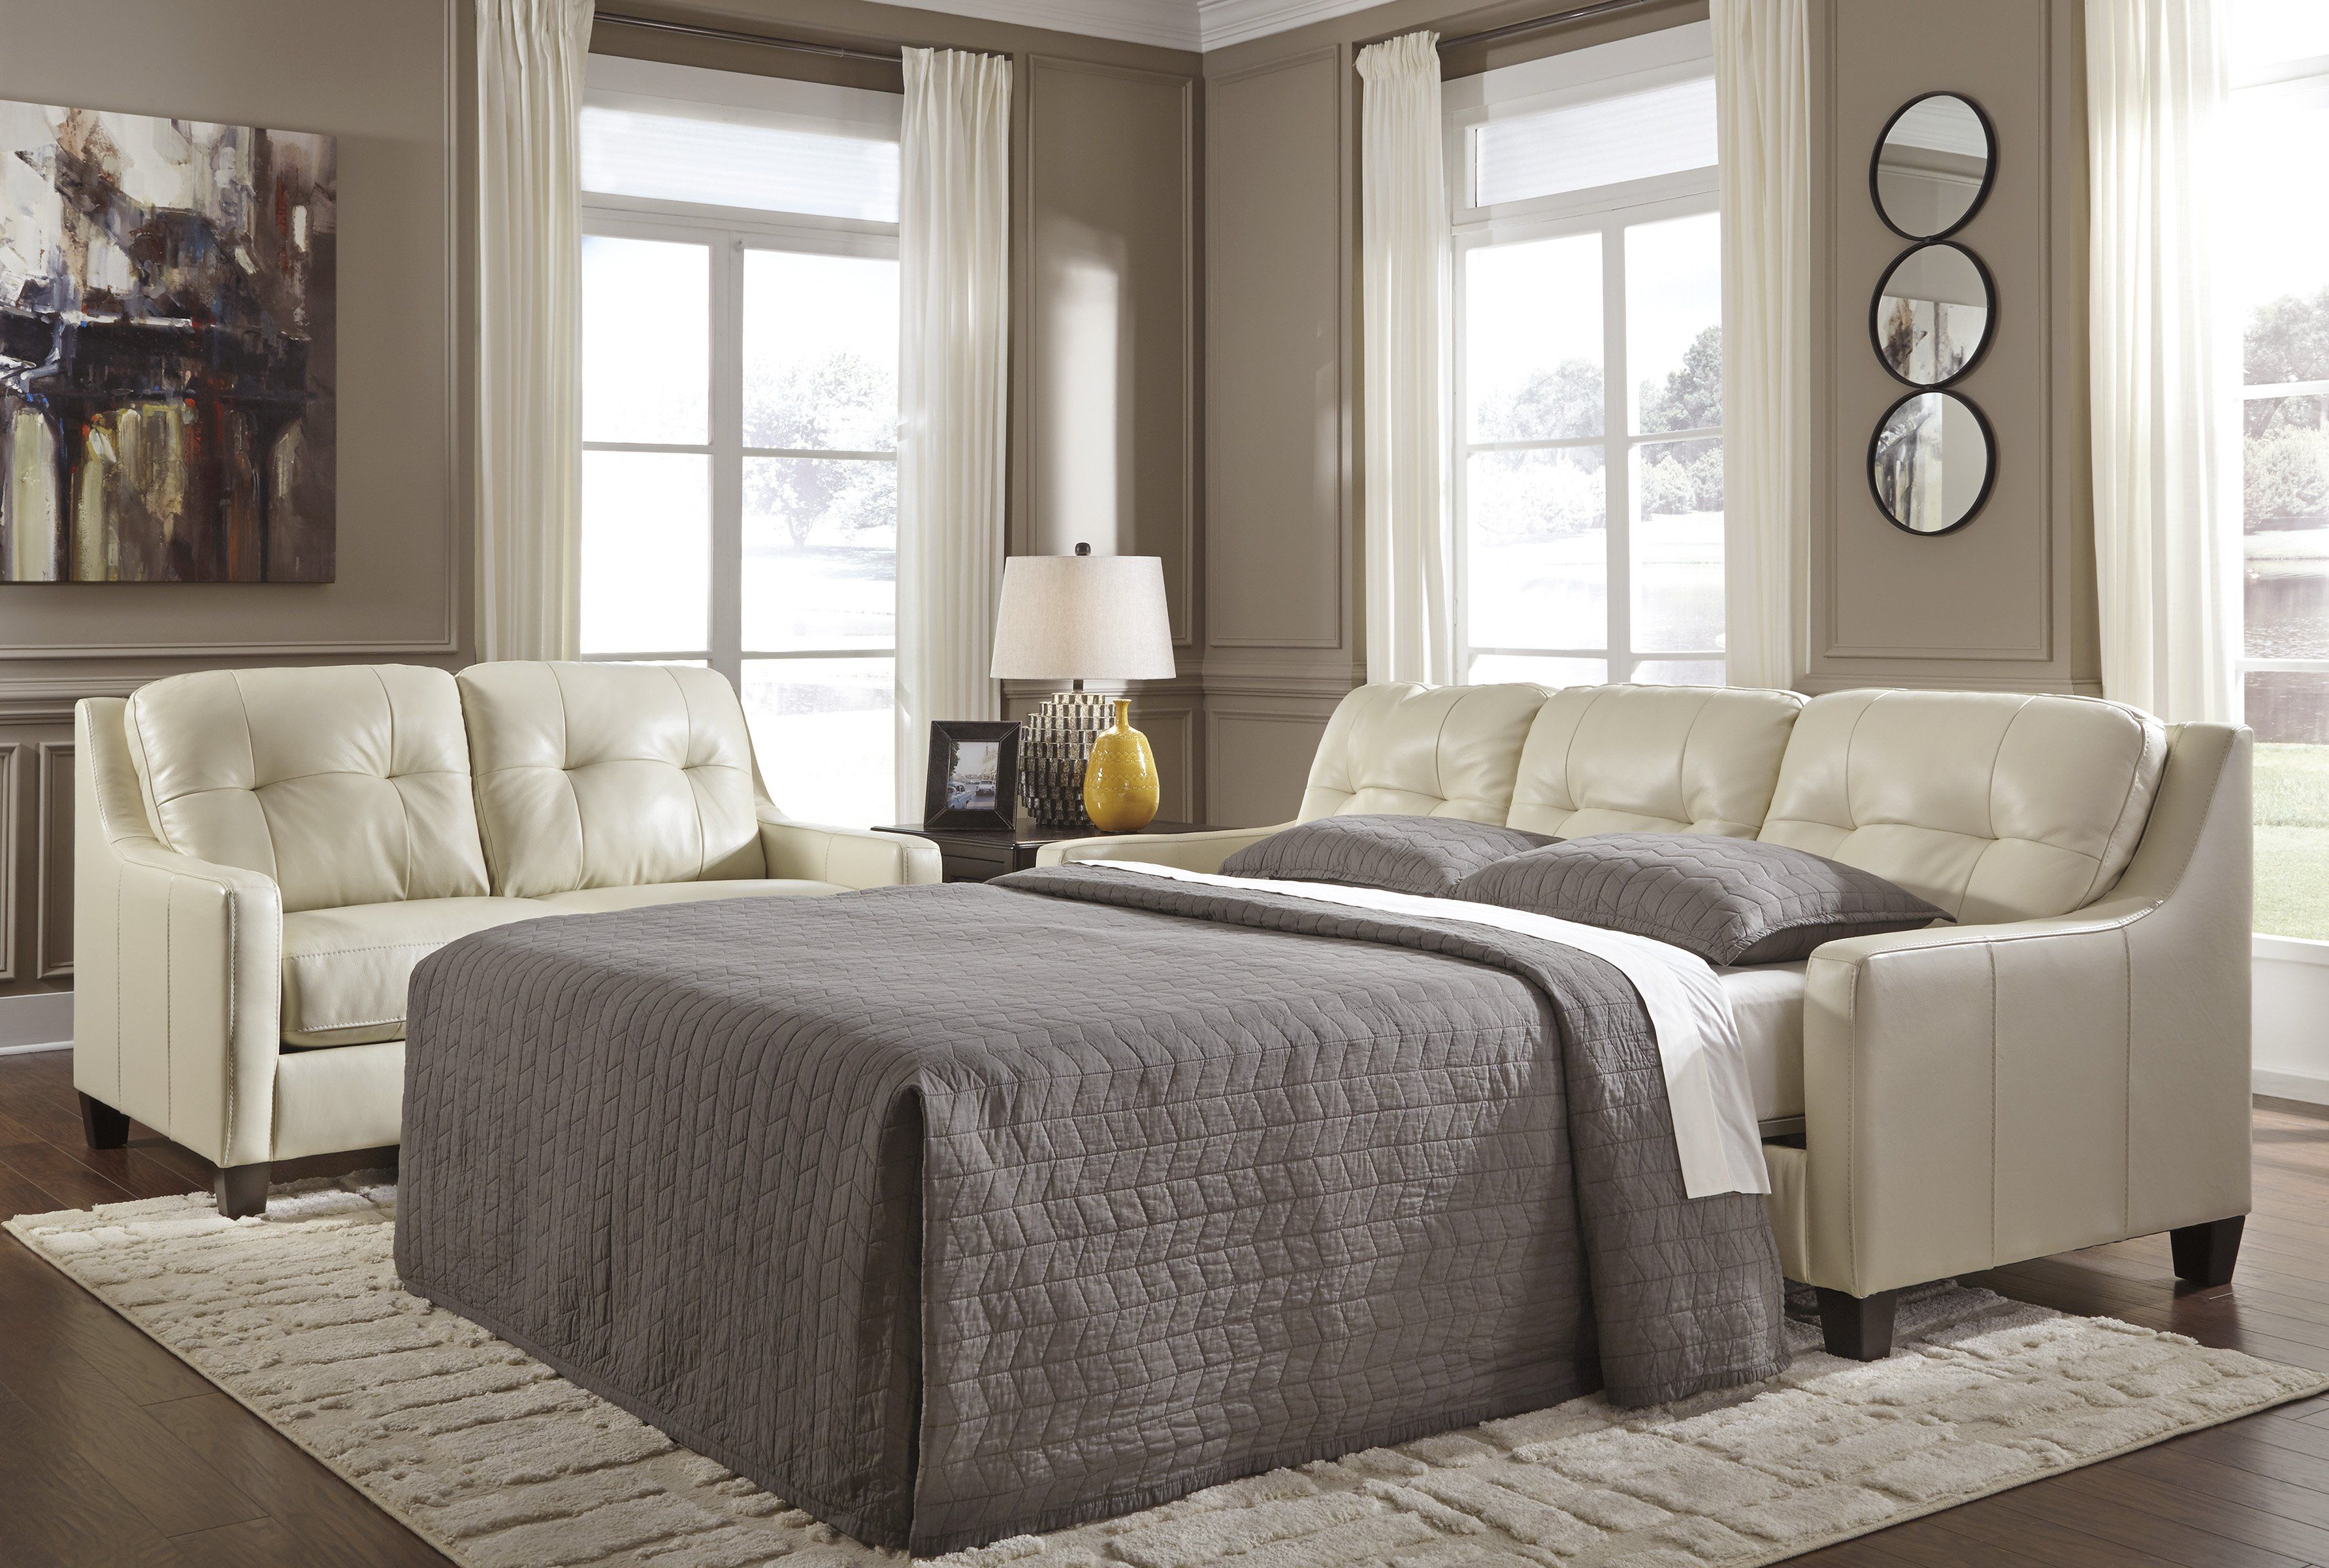 O'Kean Queen Sofa Sleeper Furniture, Leather sofa bed